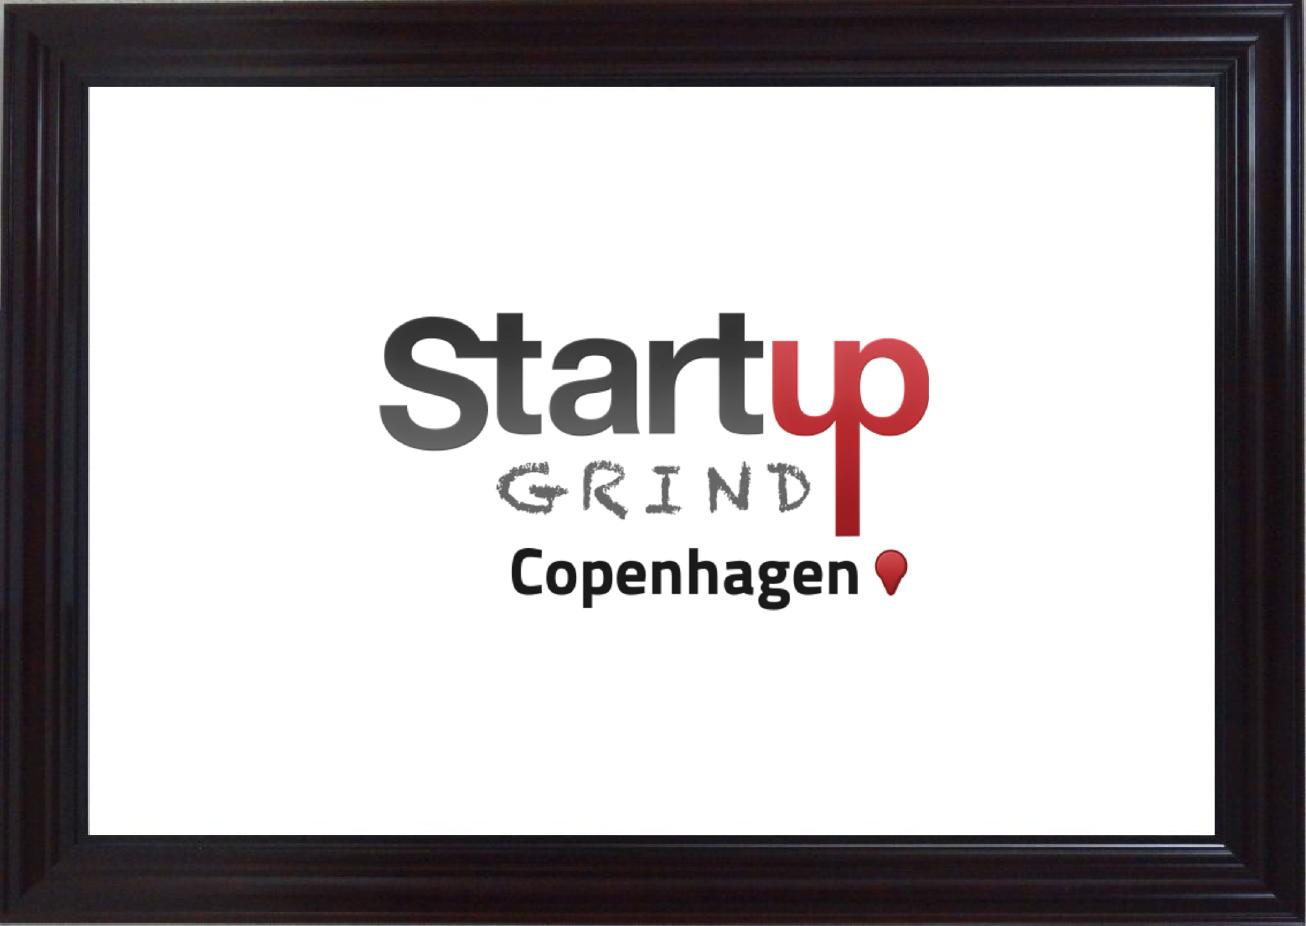 Startup Grind: Klaus Nyengaard